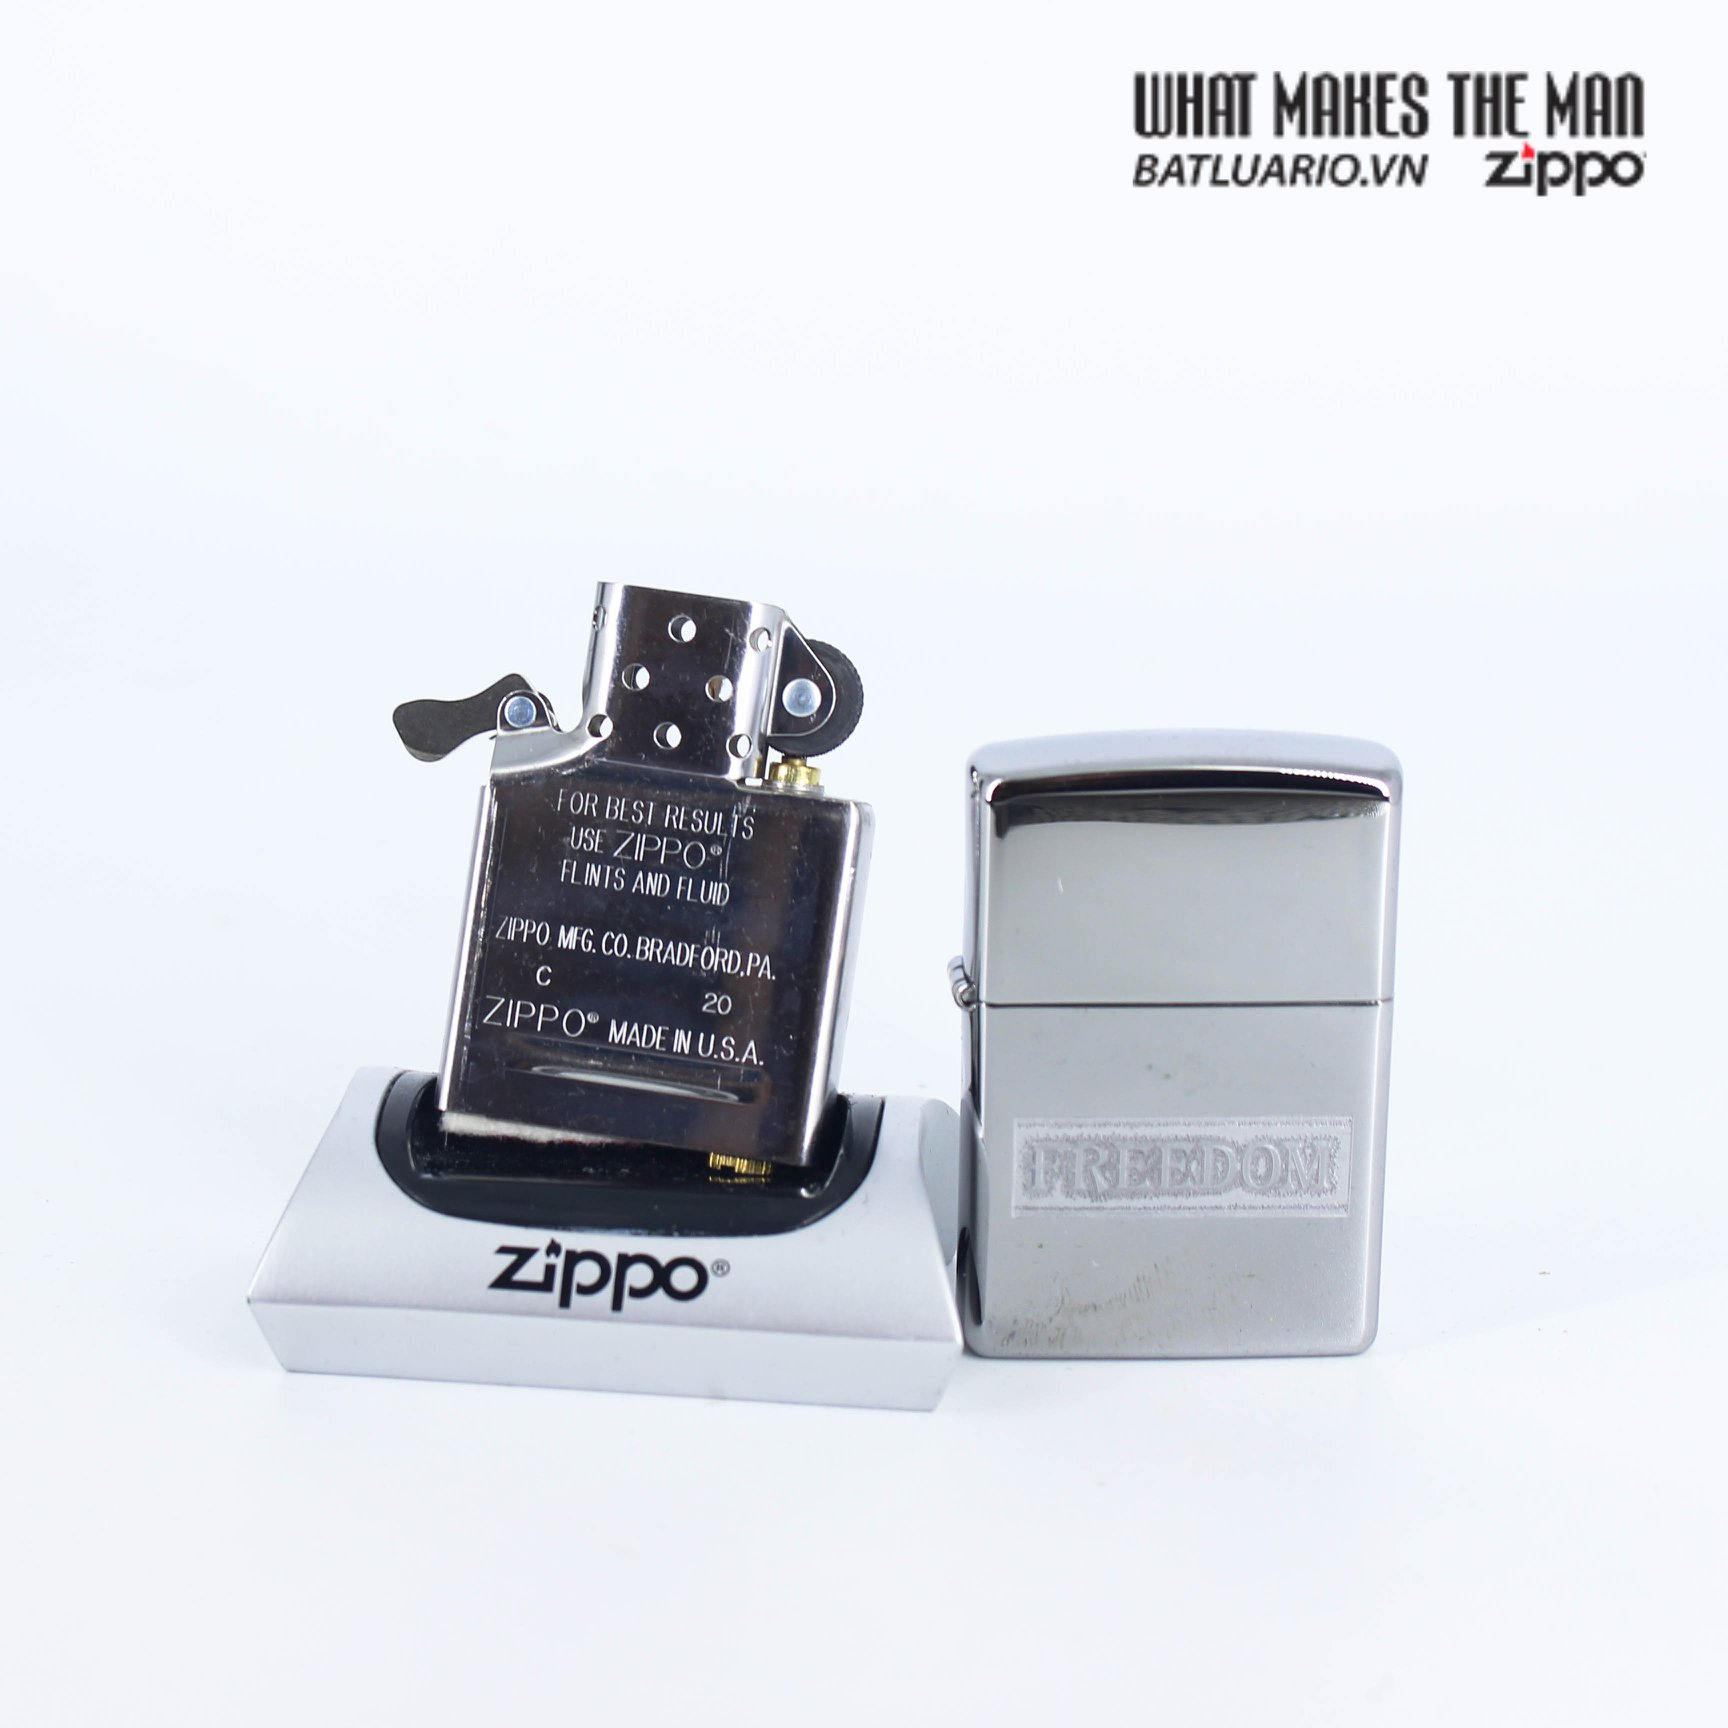 Zippo 49129 - Zippo Etched Freedom Design High Polish Chrome 7